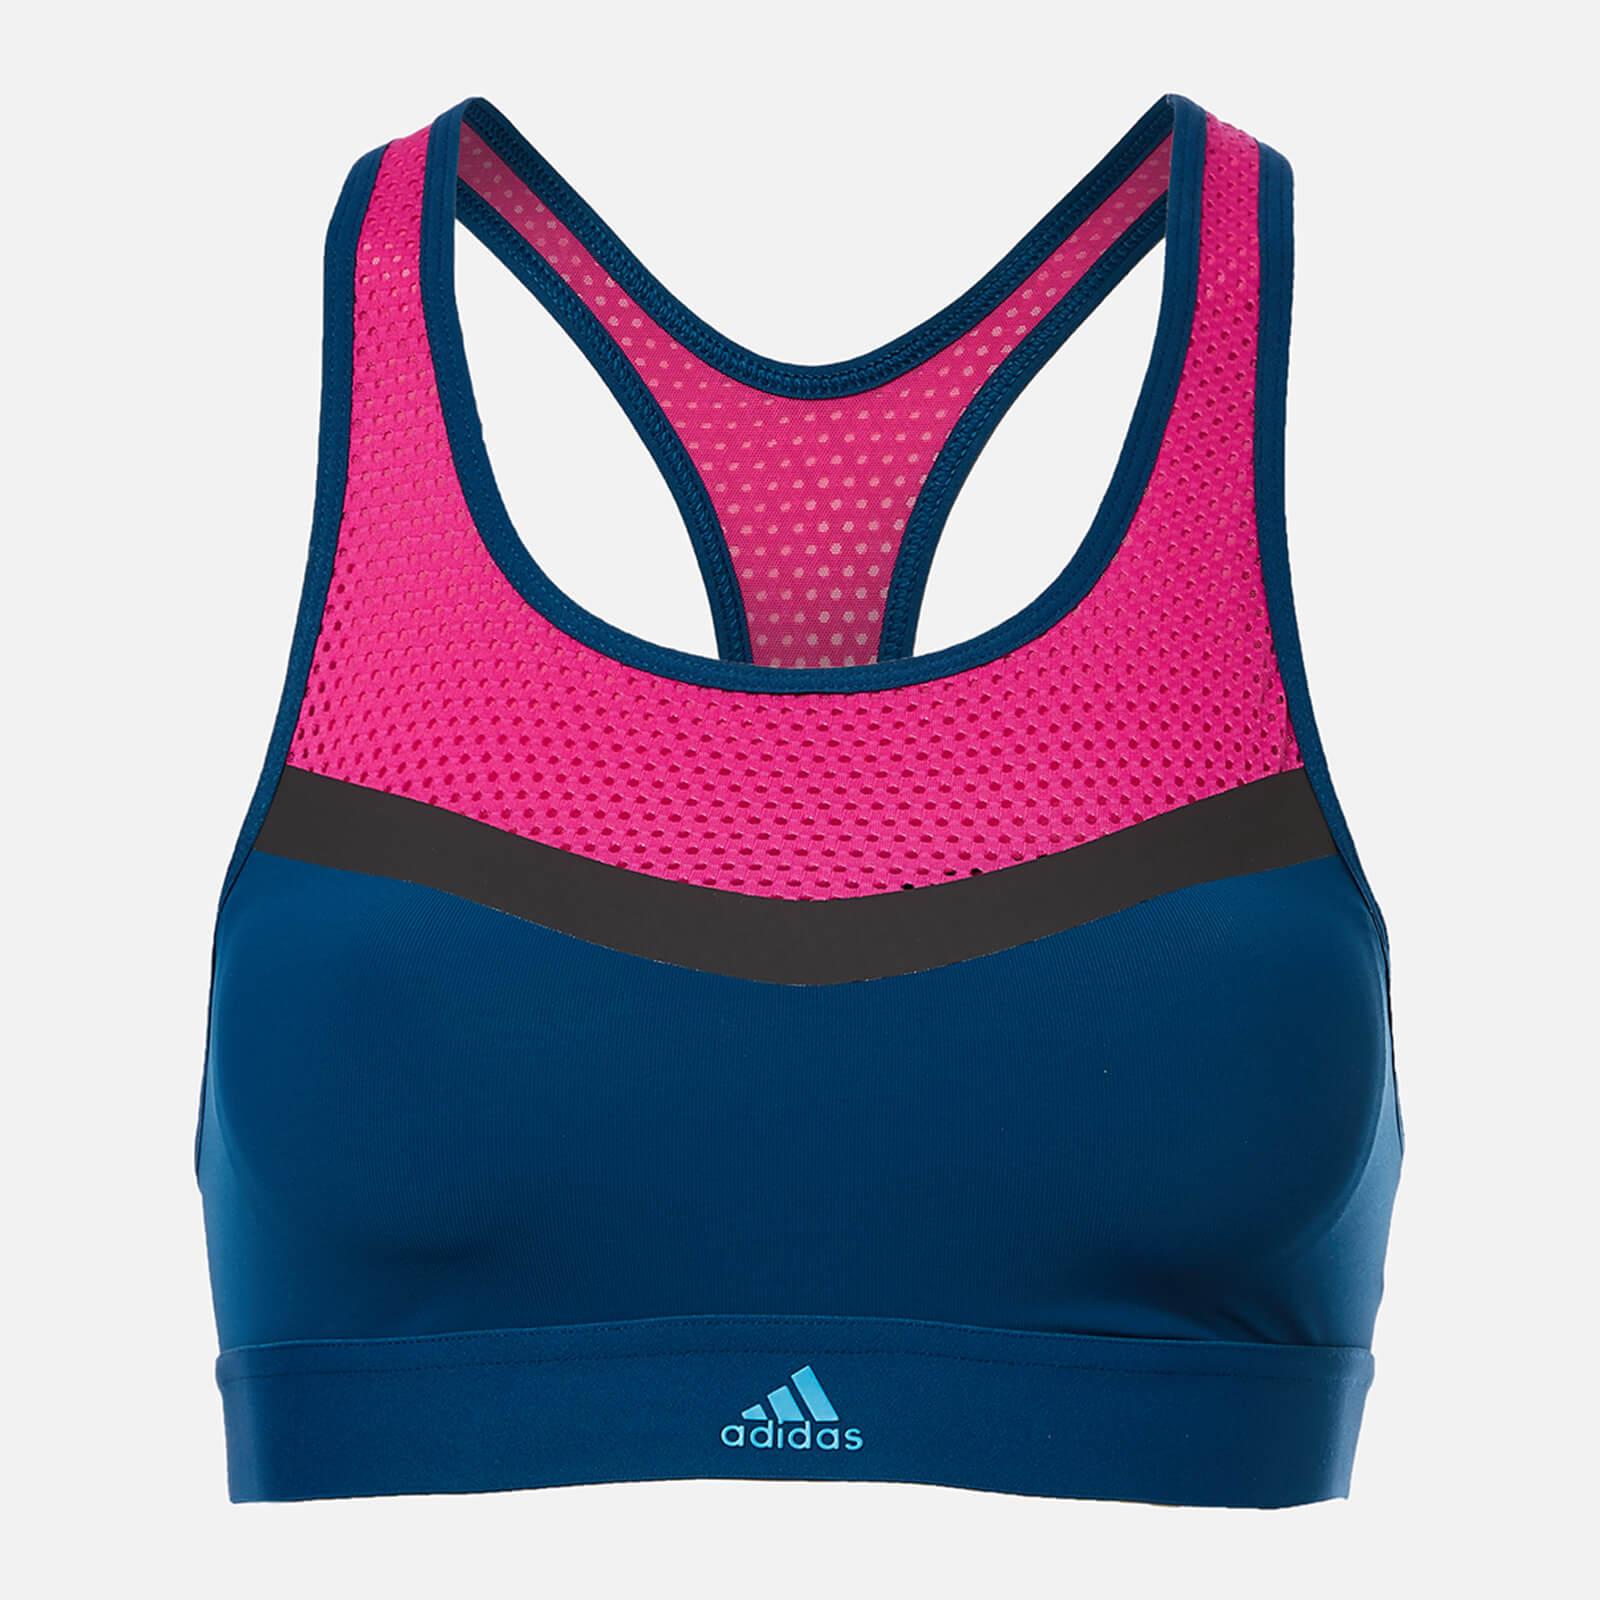 adidas Women's Don't Rest Swim Crop Top - Blue/Pink - 34B - Multi